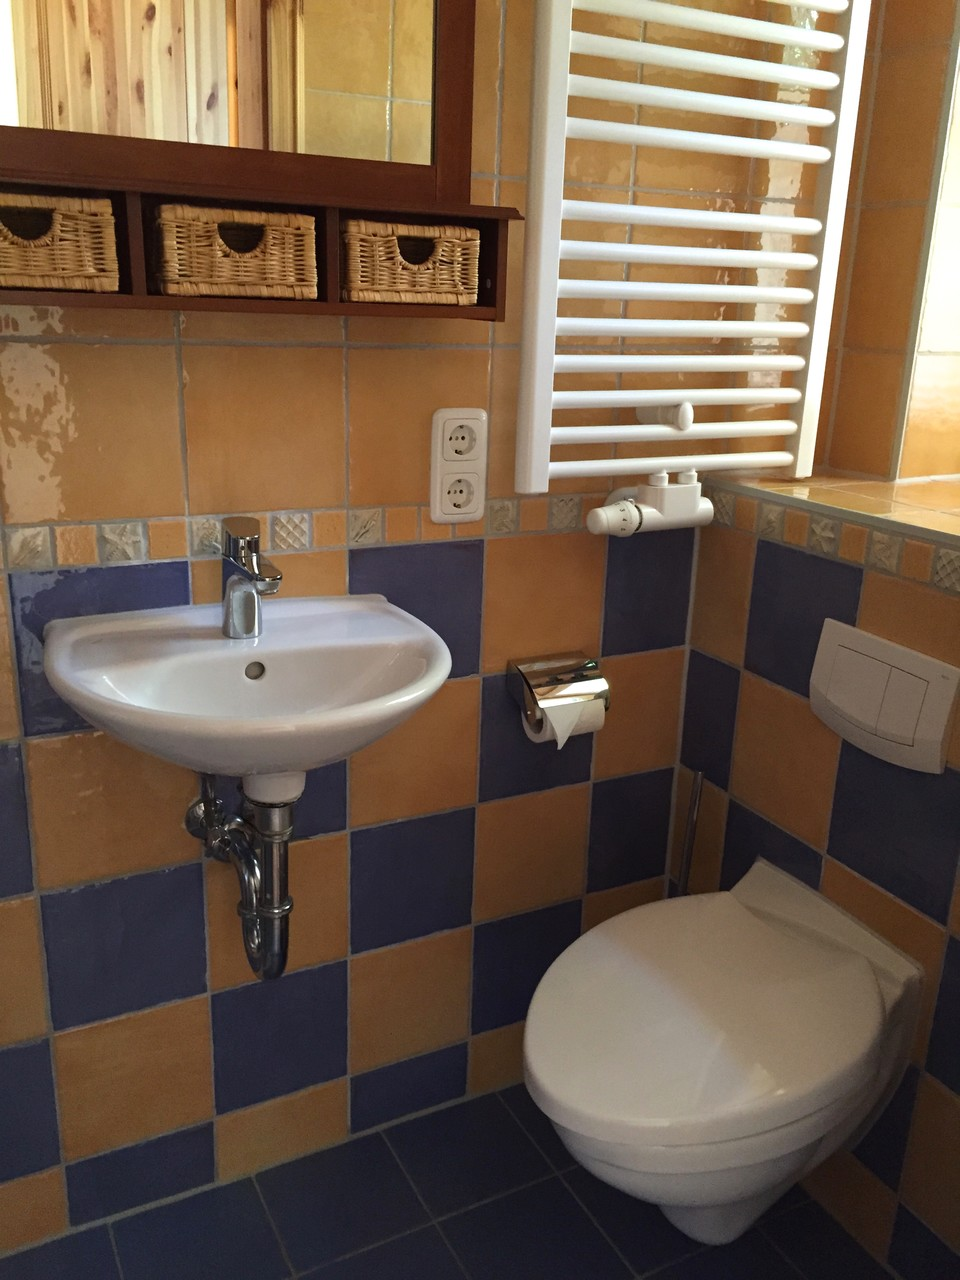 Gäste-WC mit Dusche im Erdgeschoss